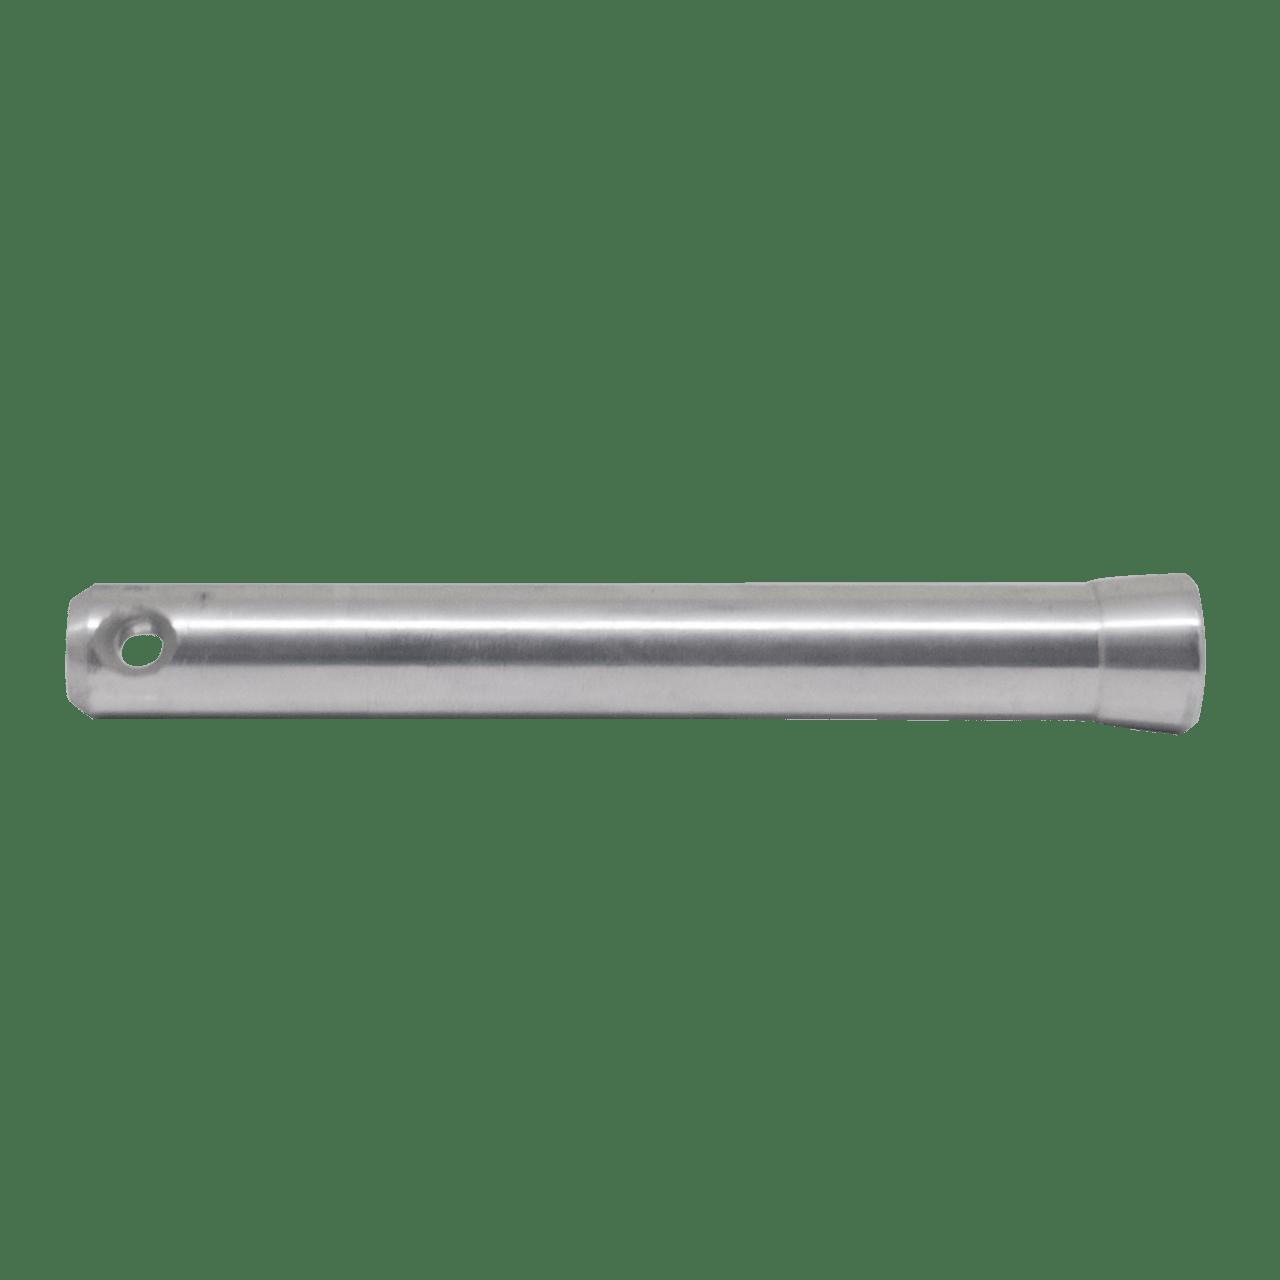 "3431 --- Rapid Hitch Adjustment Pin, 5/8"" Diameter"